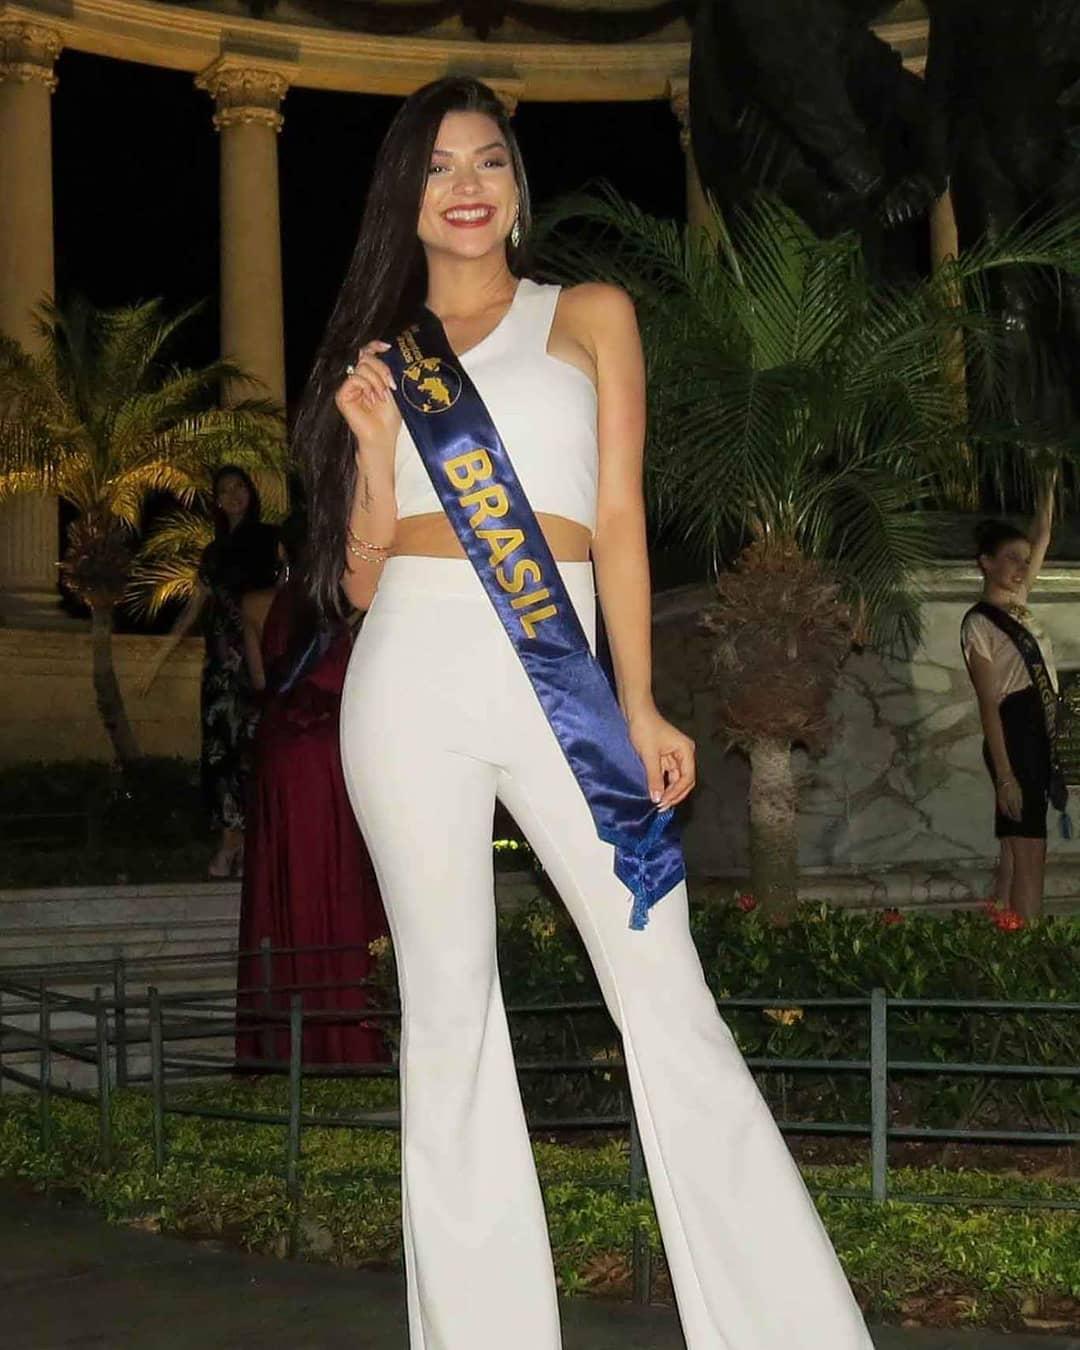 gleycy correia, miss brasil continentes unidos 2018. - Página 4 41434910